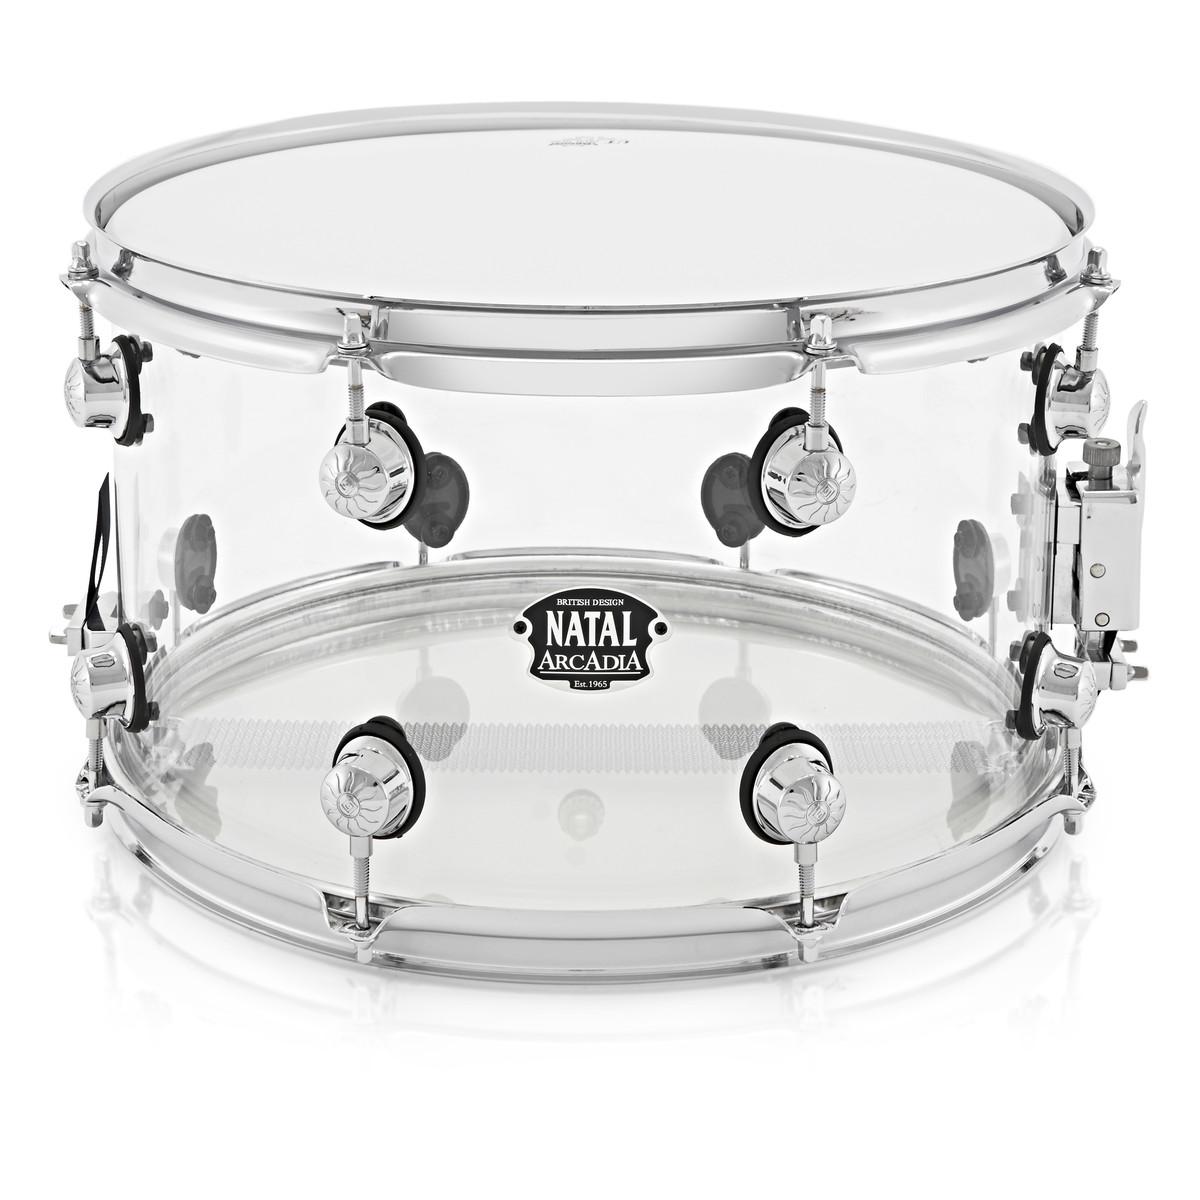 Natal Arcadia 14 x 8 Acrylic Snare, Transparent at Gear4music.com